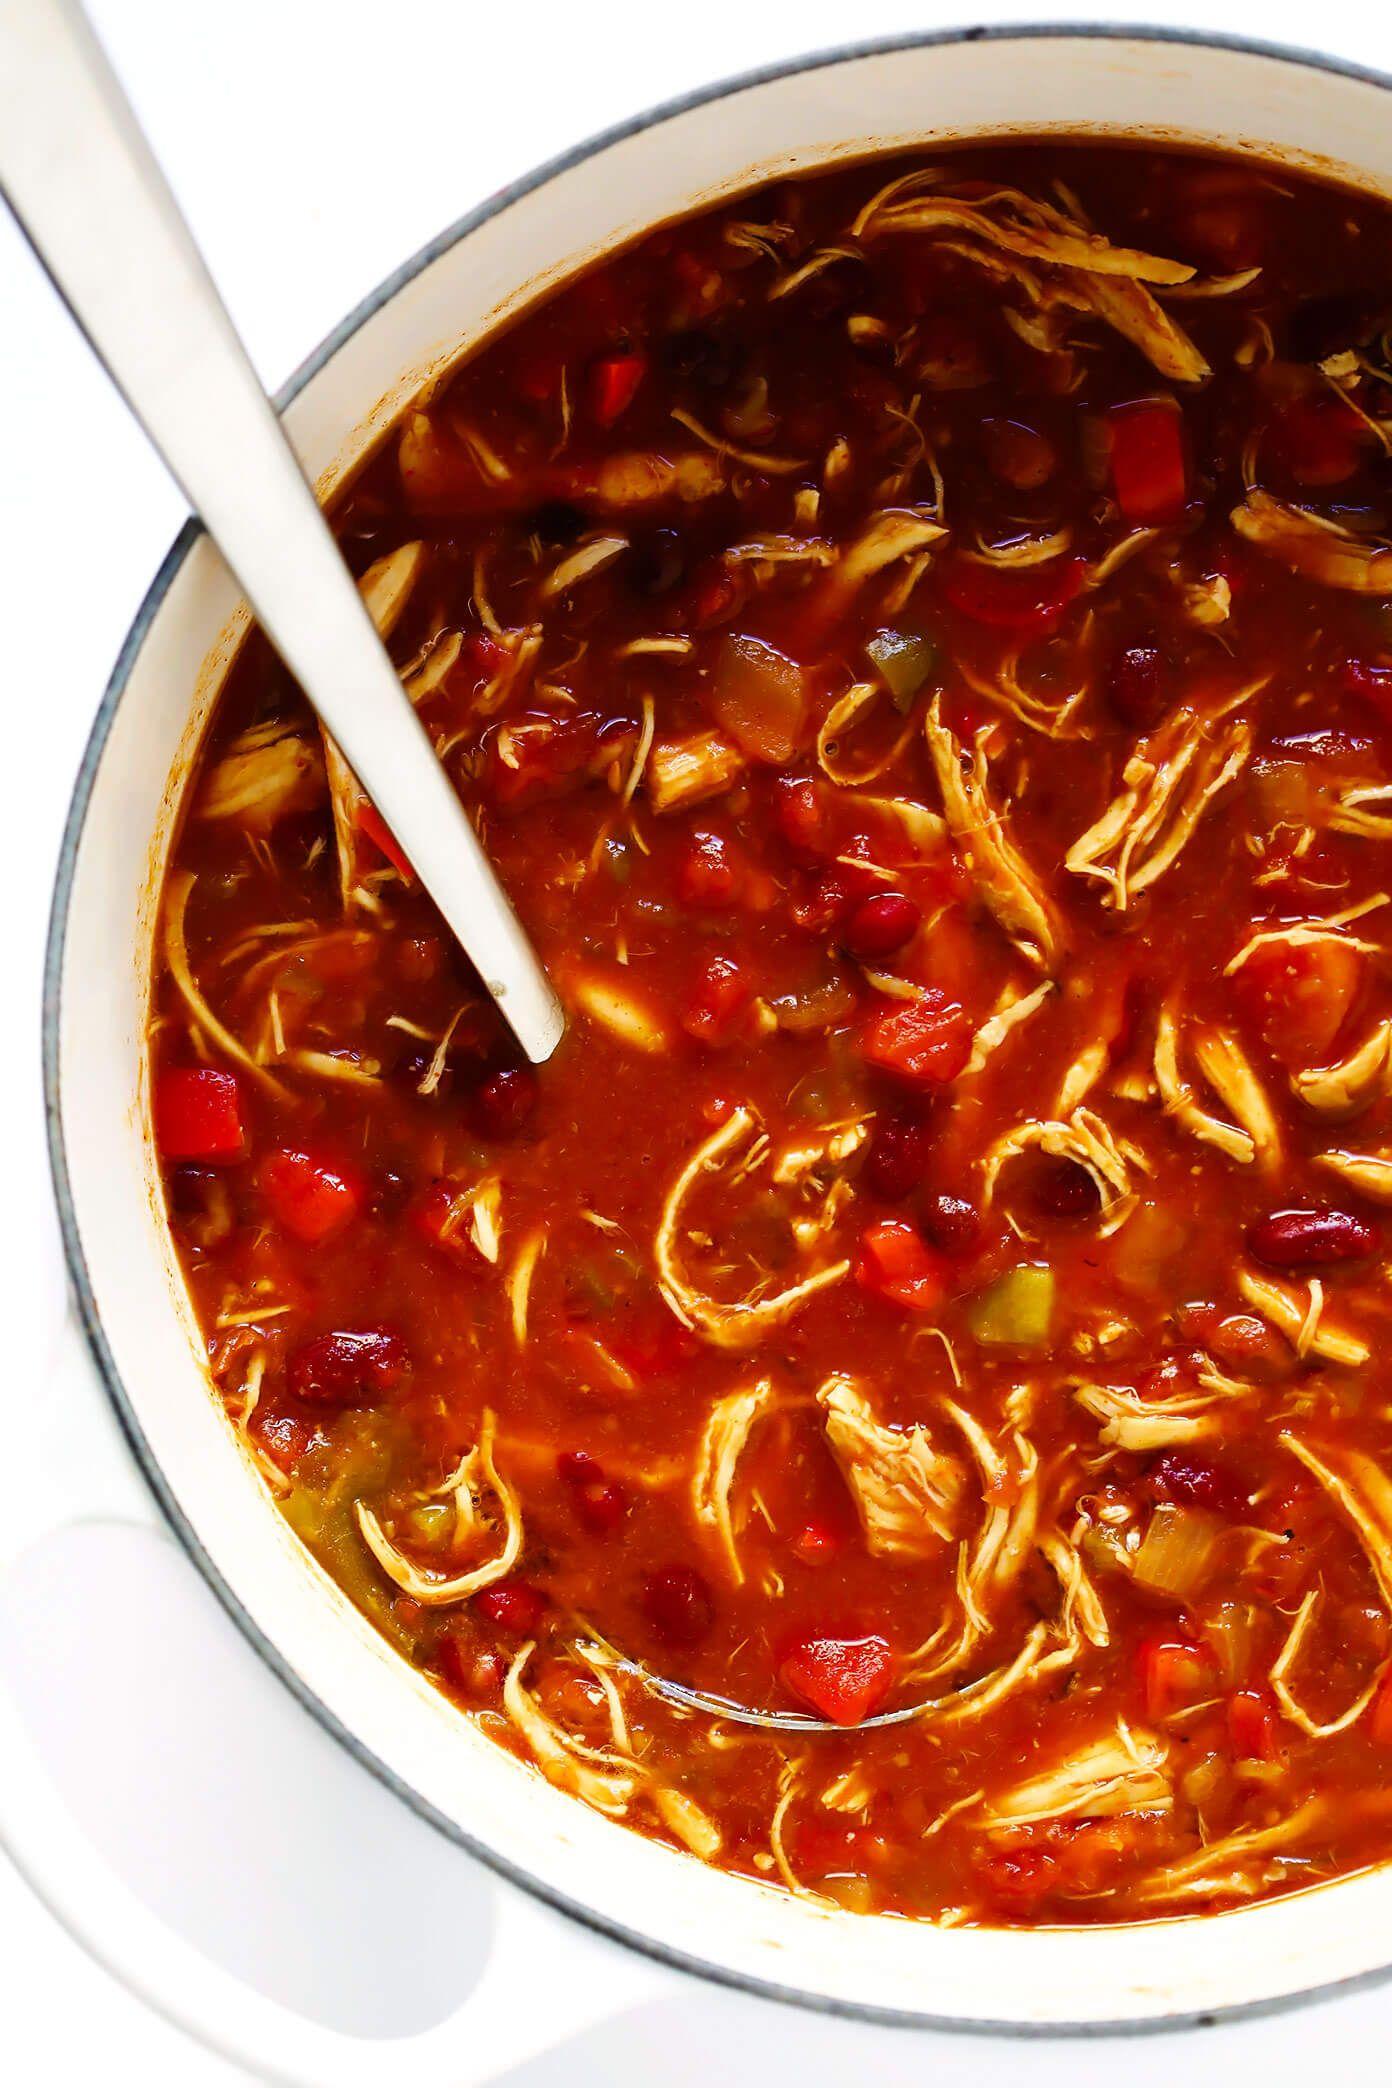 Easy Chicken Chili Recipe In 2020 Chicken Chili Easy Chicken